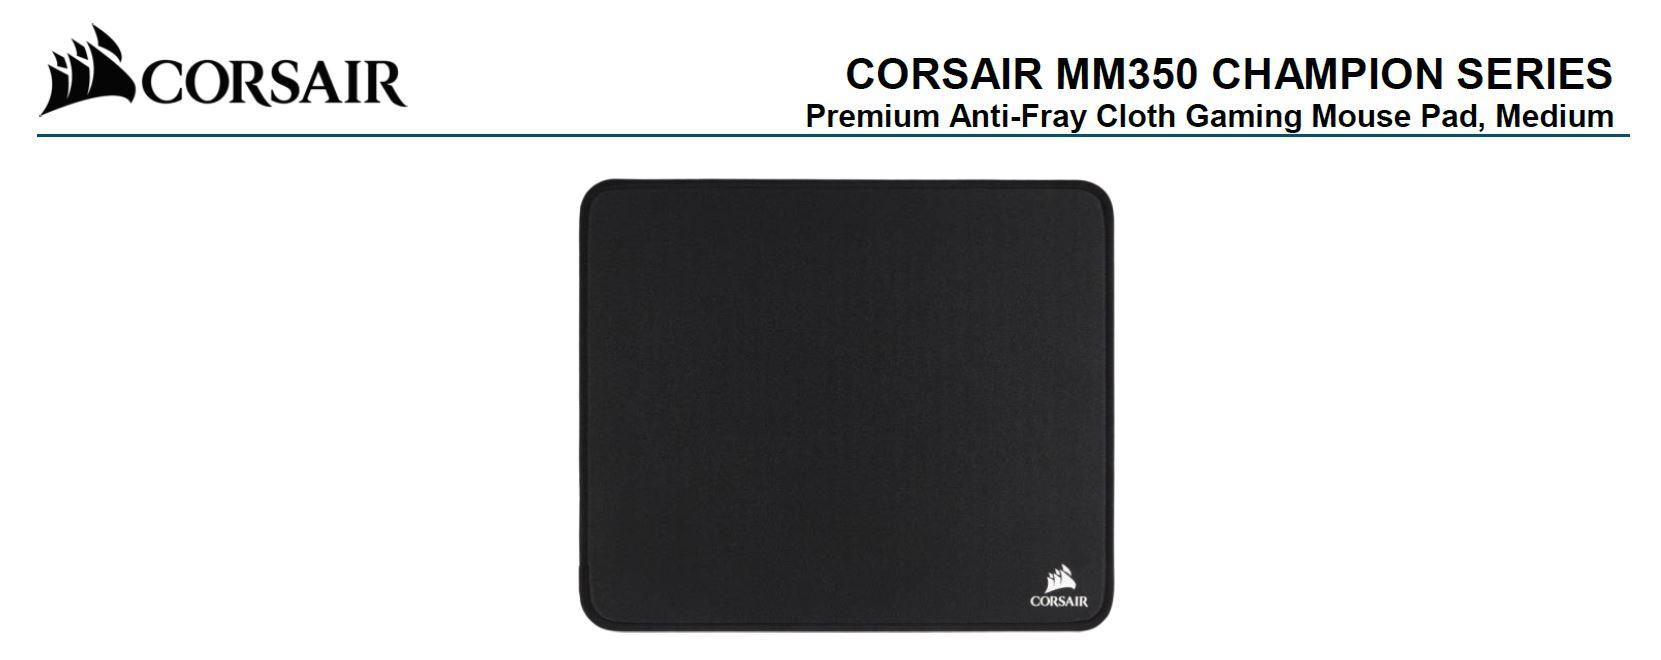 Corsair MM350 Champion Series Medium Anti-Fray Cloth Gaming Mouse Pad. 320 x 270mm 2 Years Warranty